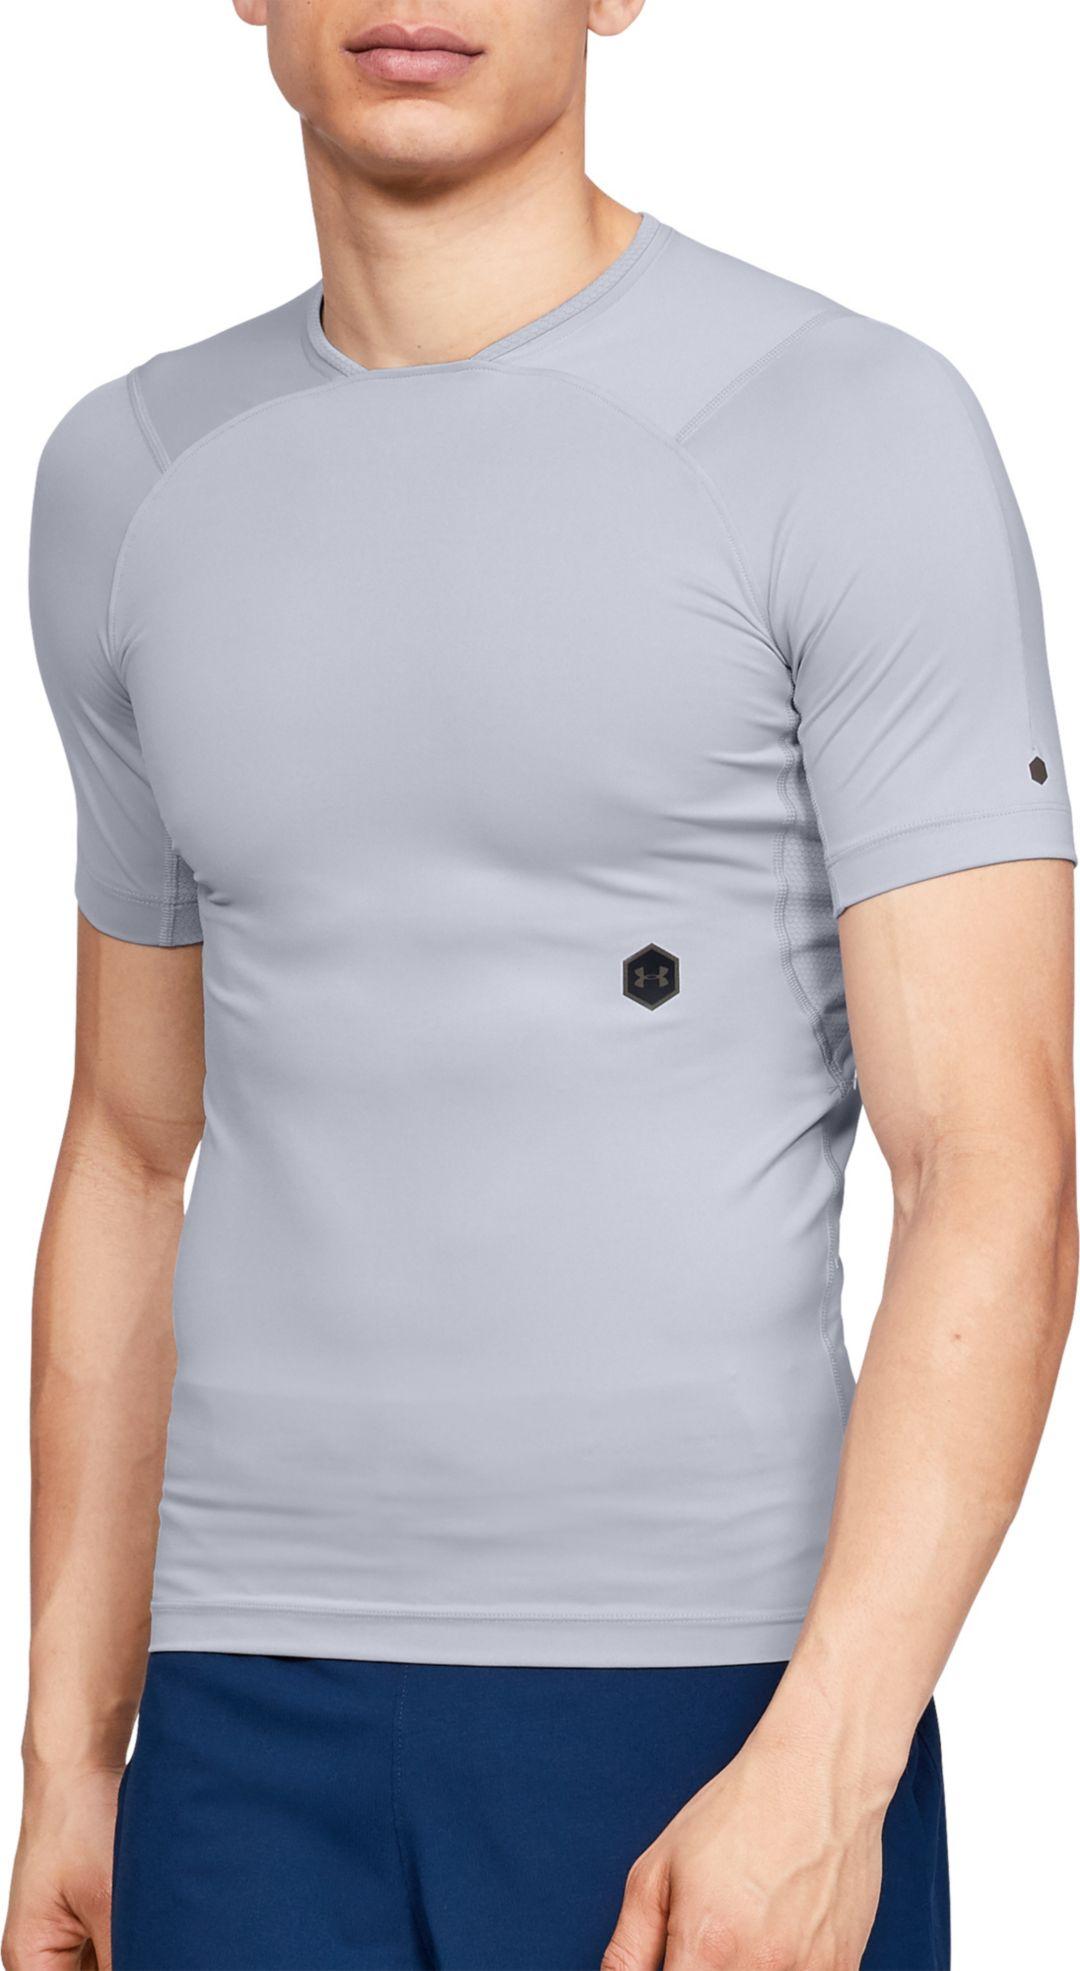 9e46a97231 Under Armour Men's RUSH Compression Short Sleeve Shirt